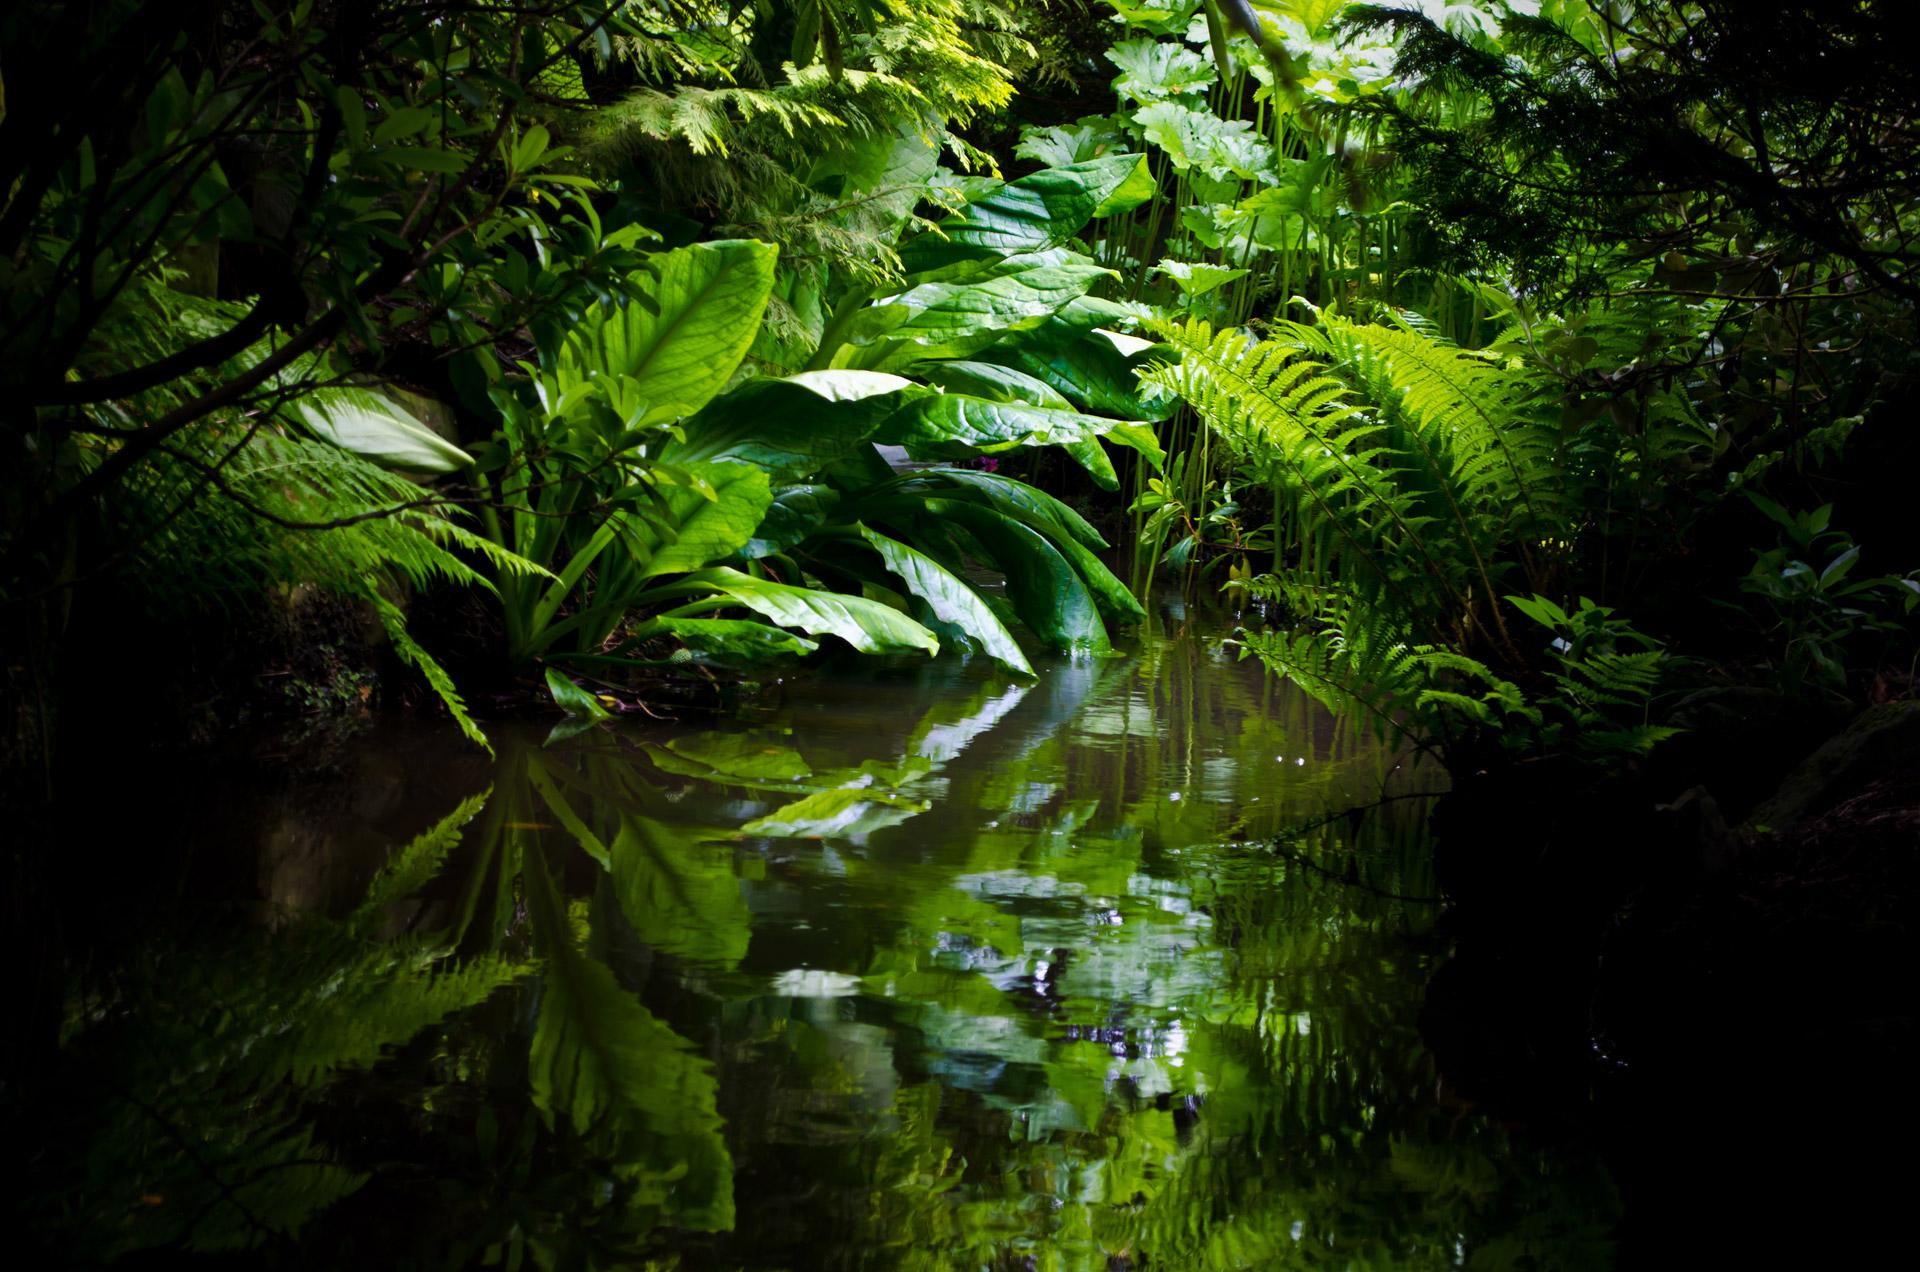 Amazon jungle pandemic ayahuasca ceremony safety